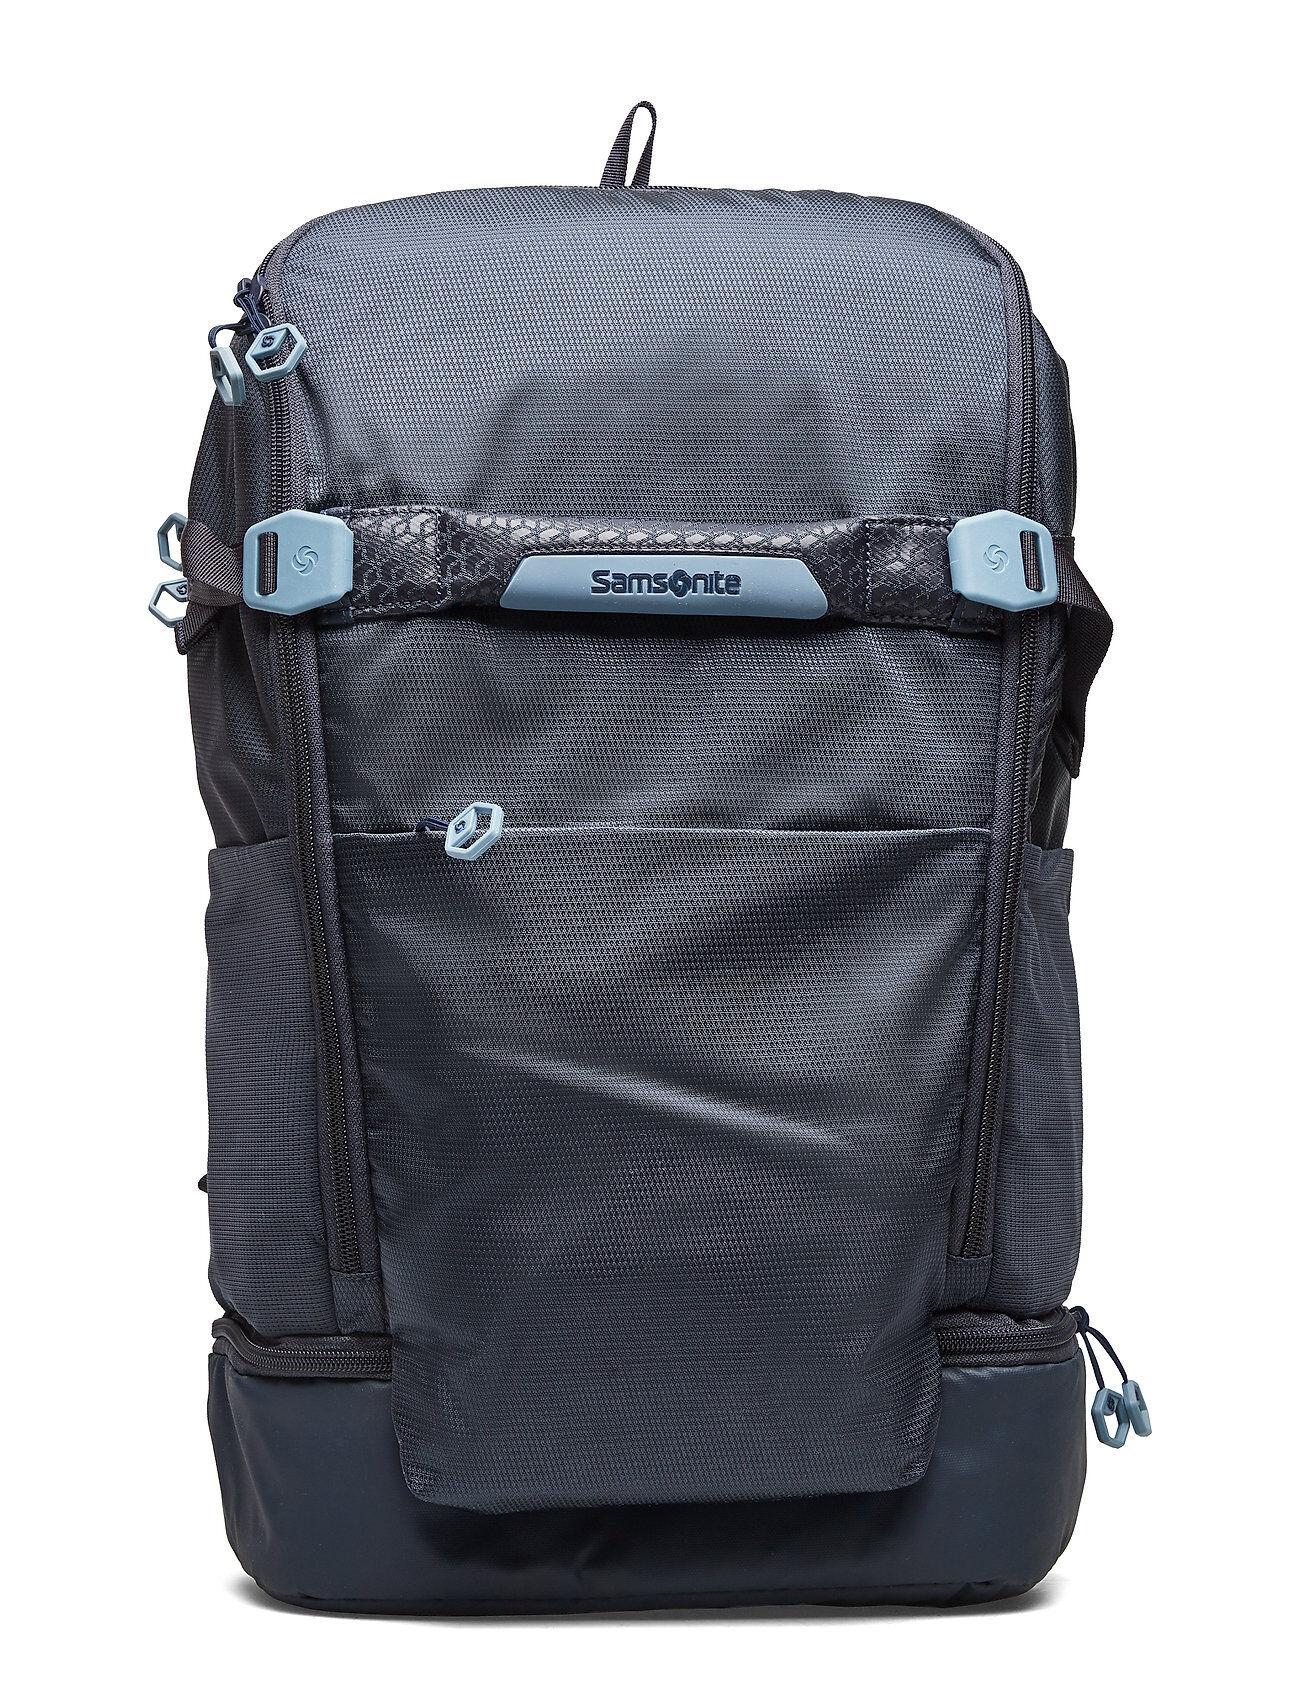 Samsonite Hexa-Packs Laptop Backpack Reppu Laukku Sininen